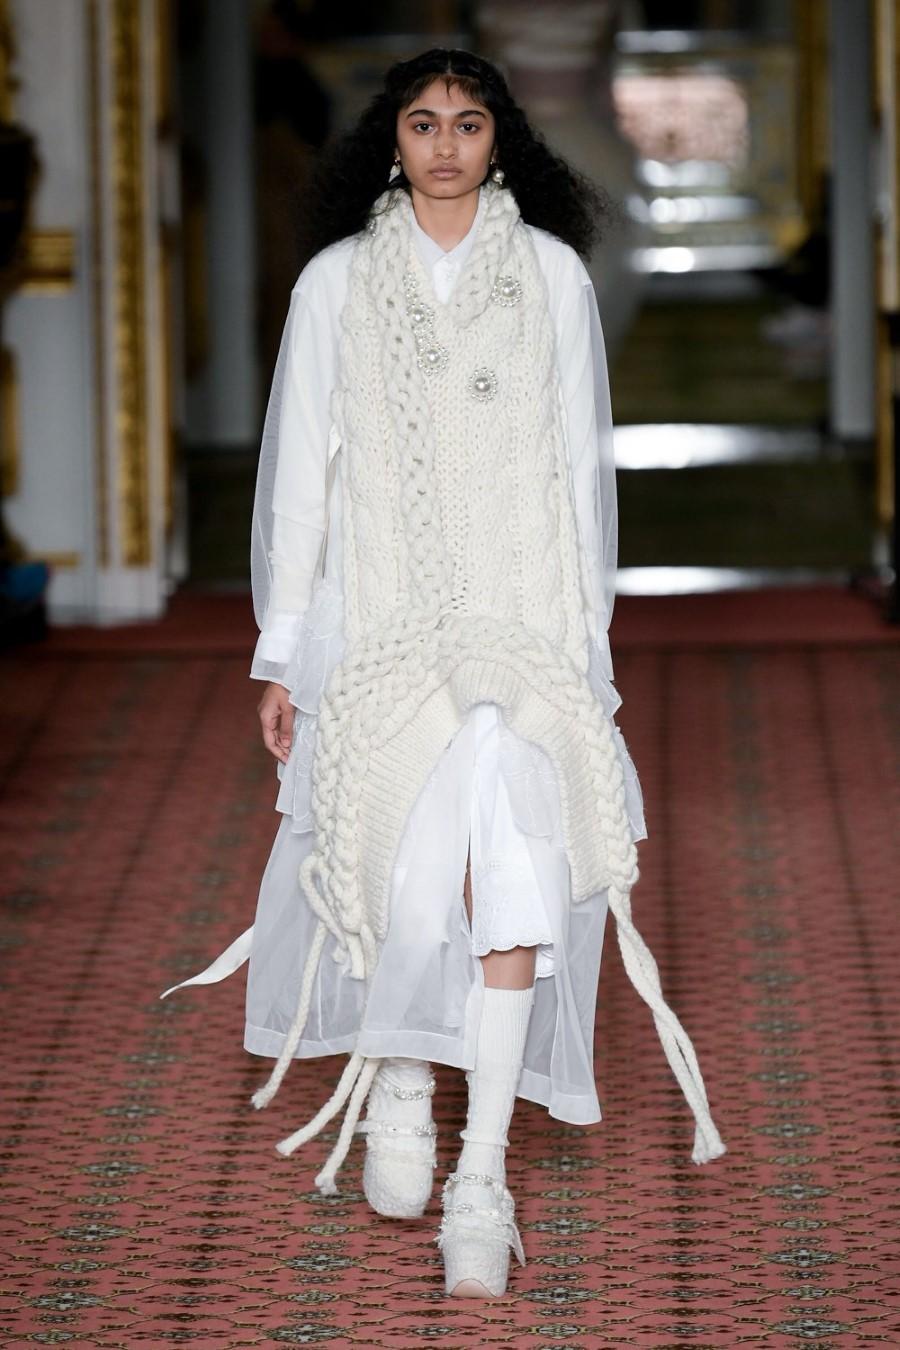 Simone Rocha - Fall Winter 2020 - LoSimone Rocha - Fall Winter 2020 - London Fashion Weekndon Fashion Week